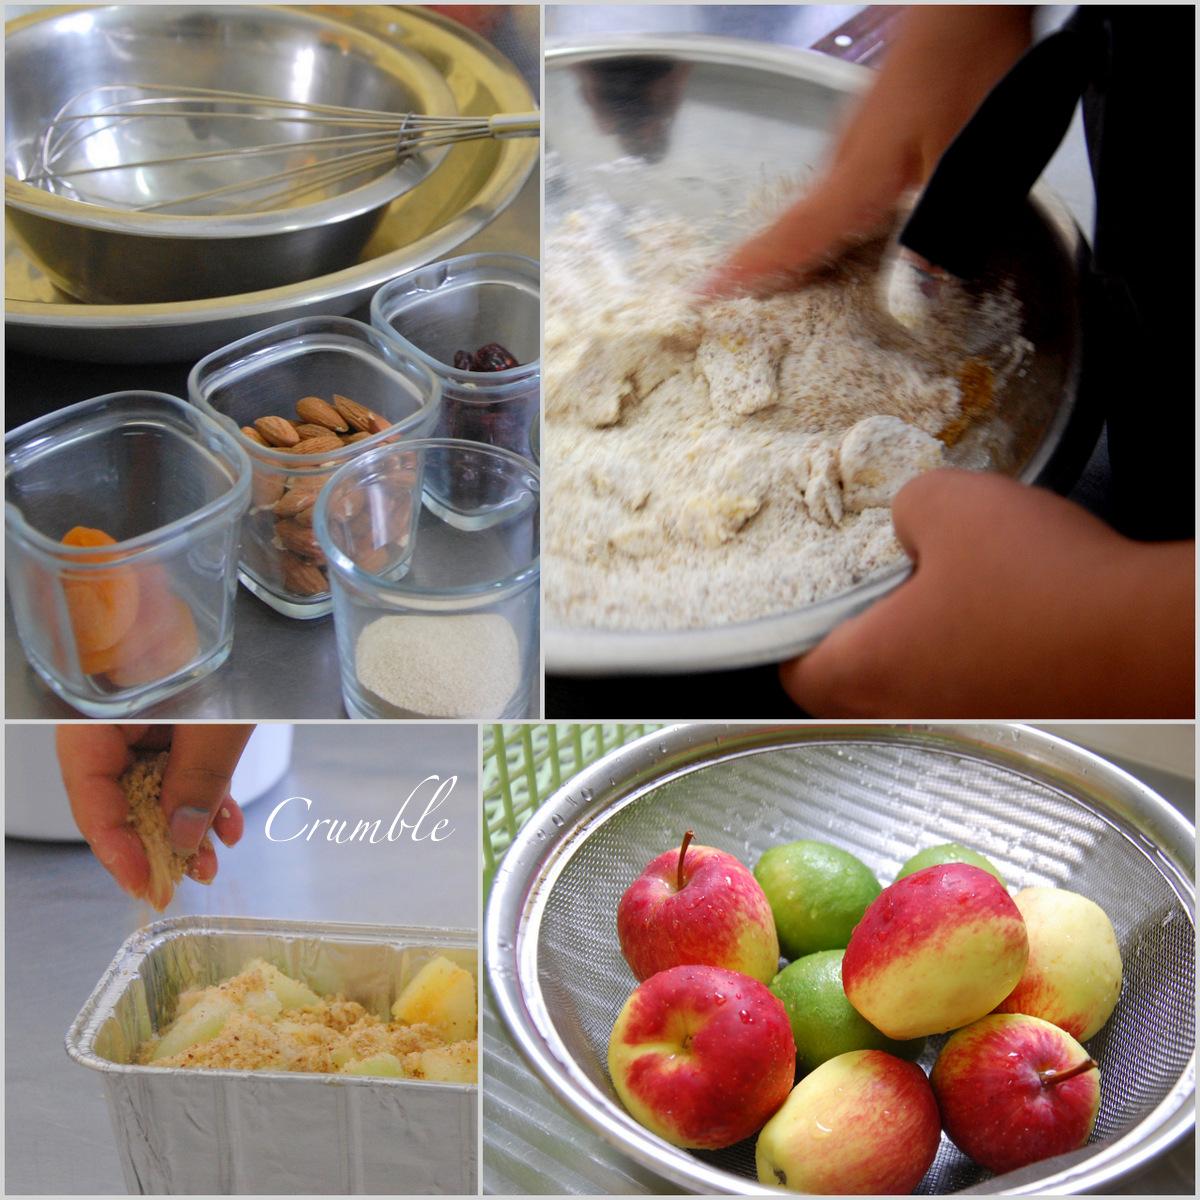 La terrasse french cuisine curso privado de pasteler a - Curso de cocina francesa ...